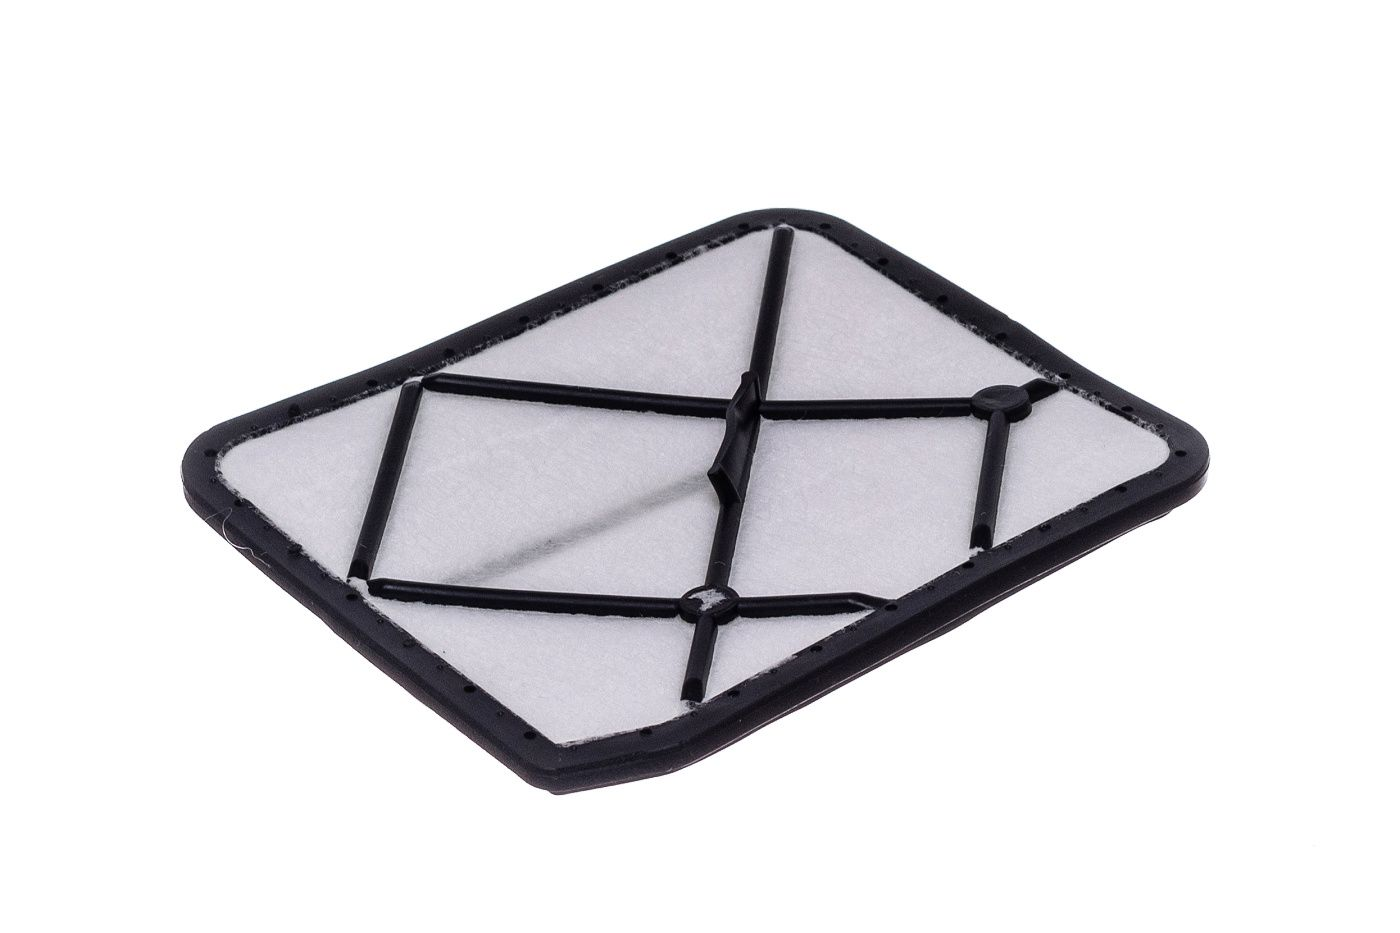 Vzduchový filtr Oleo-mac 42 44